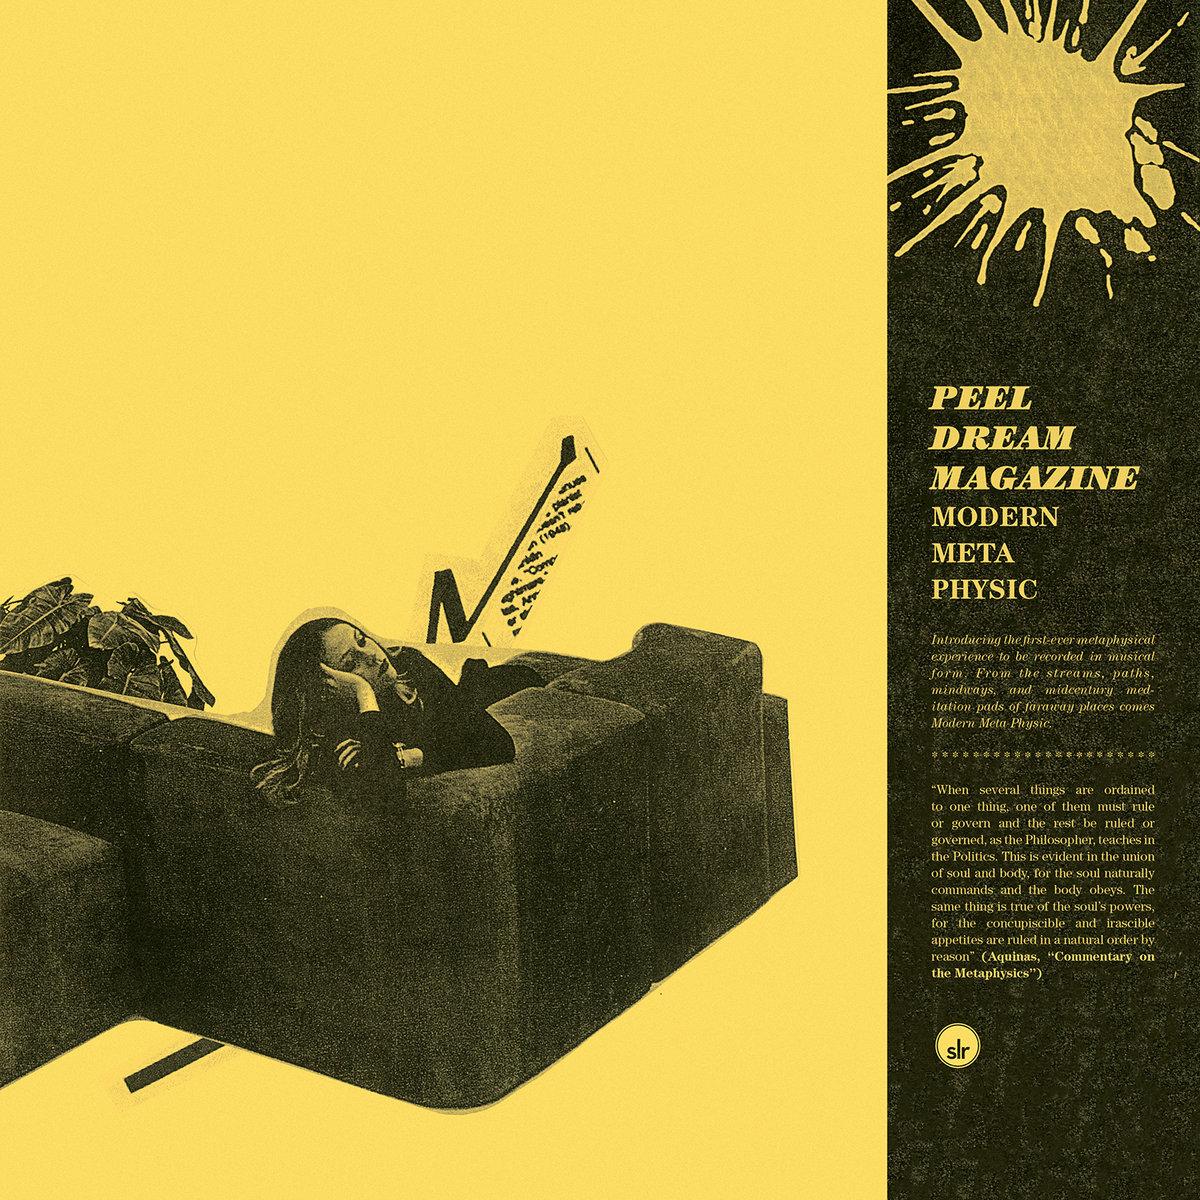 peel dream magazine.jpg